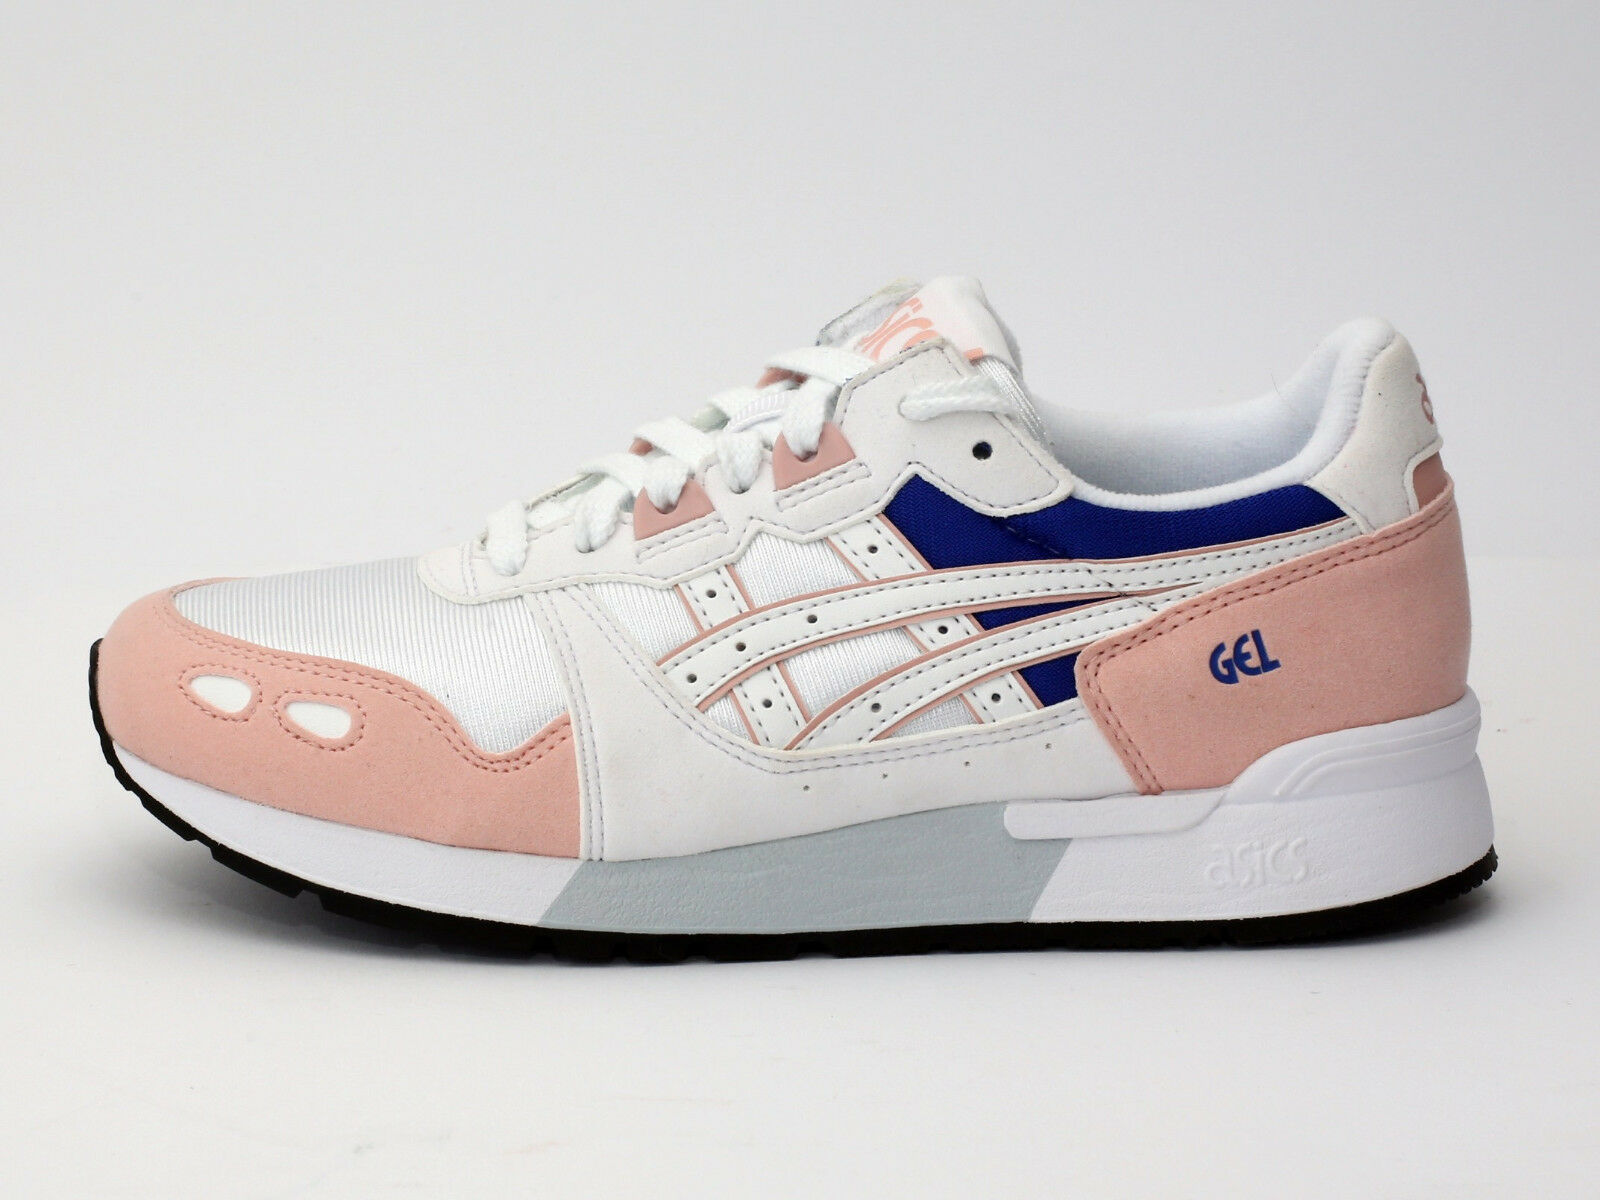 Zapatos promocionales para hombres y mujeres Asics Gel-Lyte W (HY763-1701) Damen Sneaker - Rosa/Weiß - Gr. 37,5 - Neu (ss)